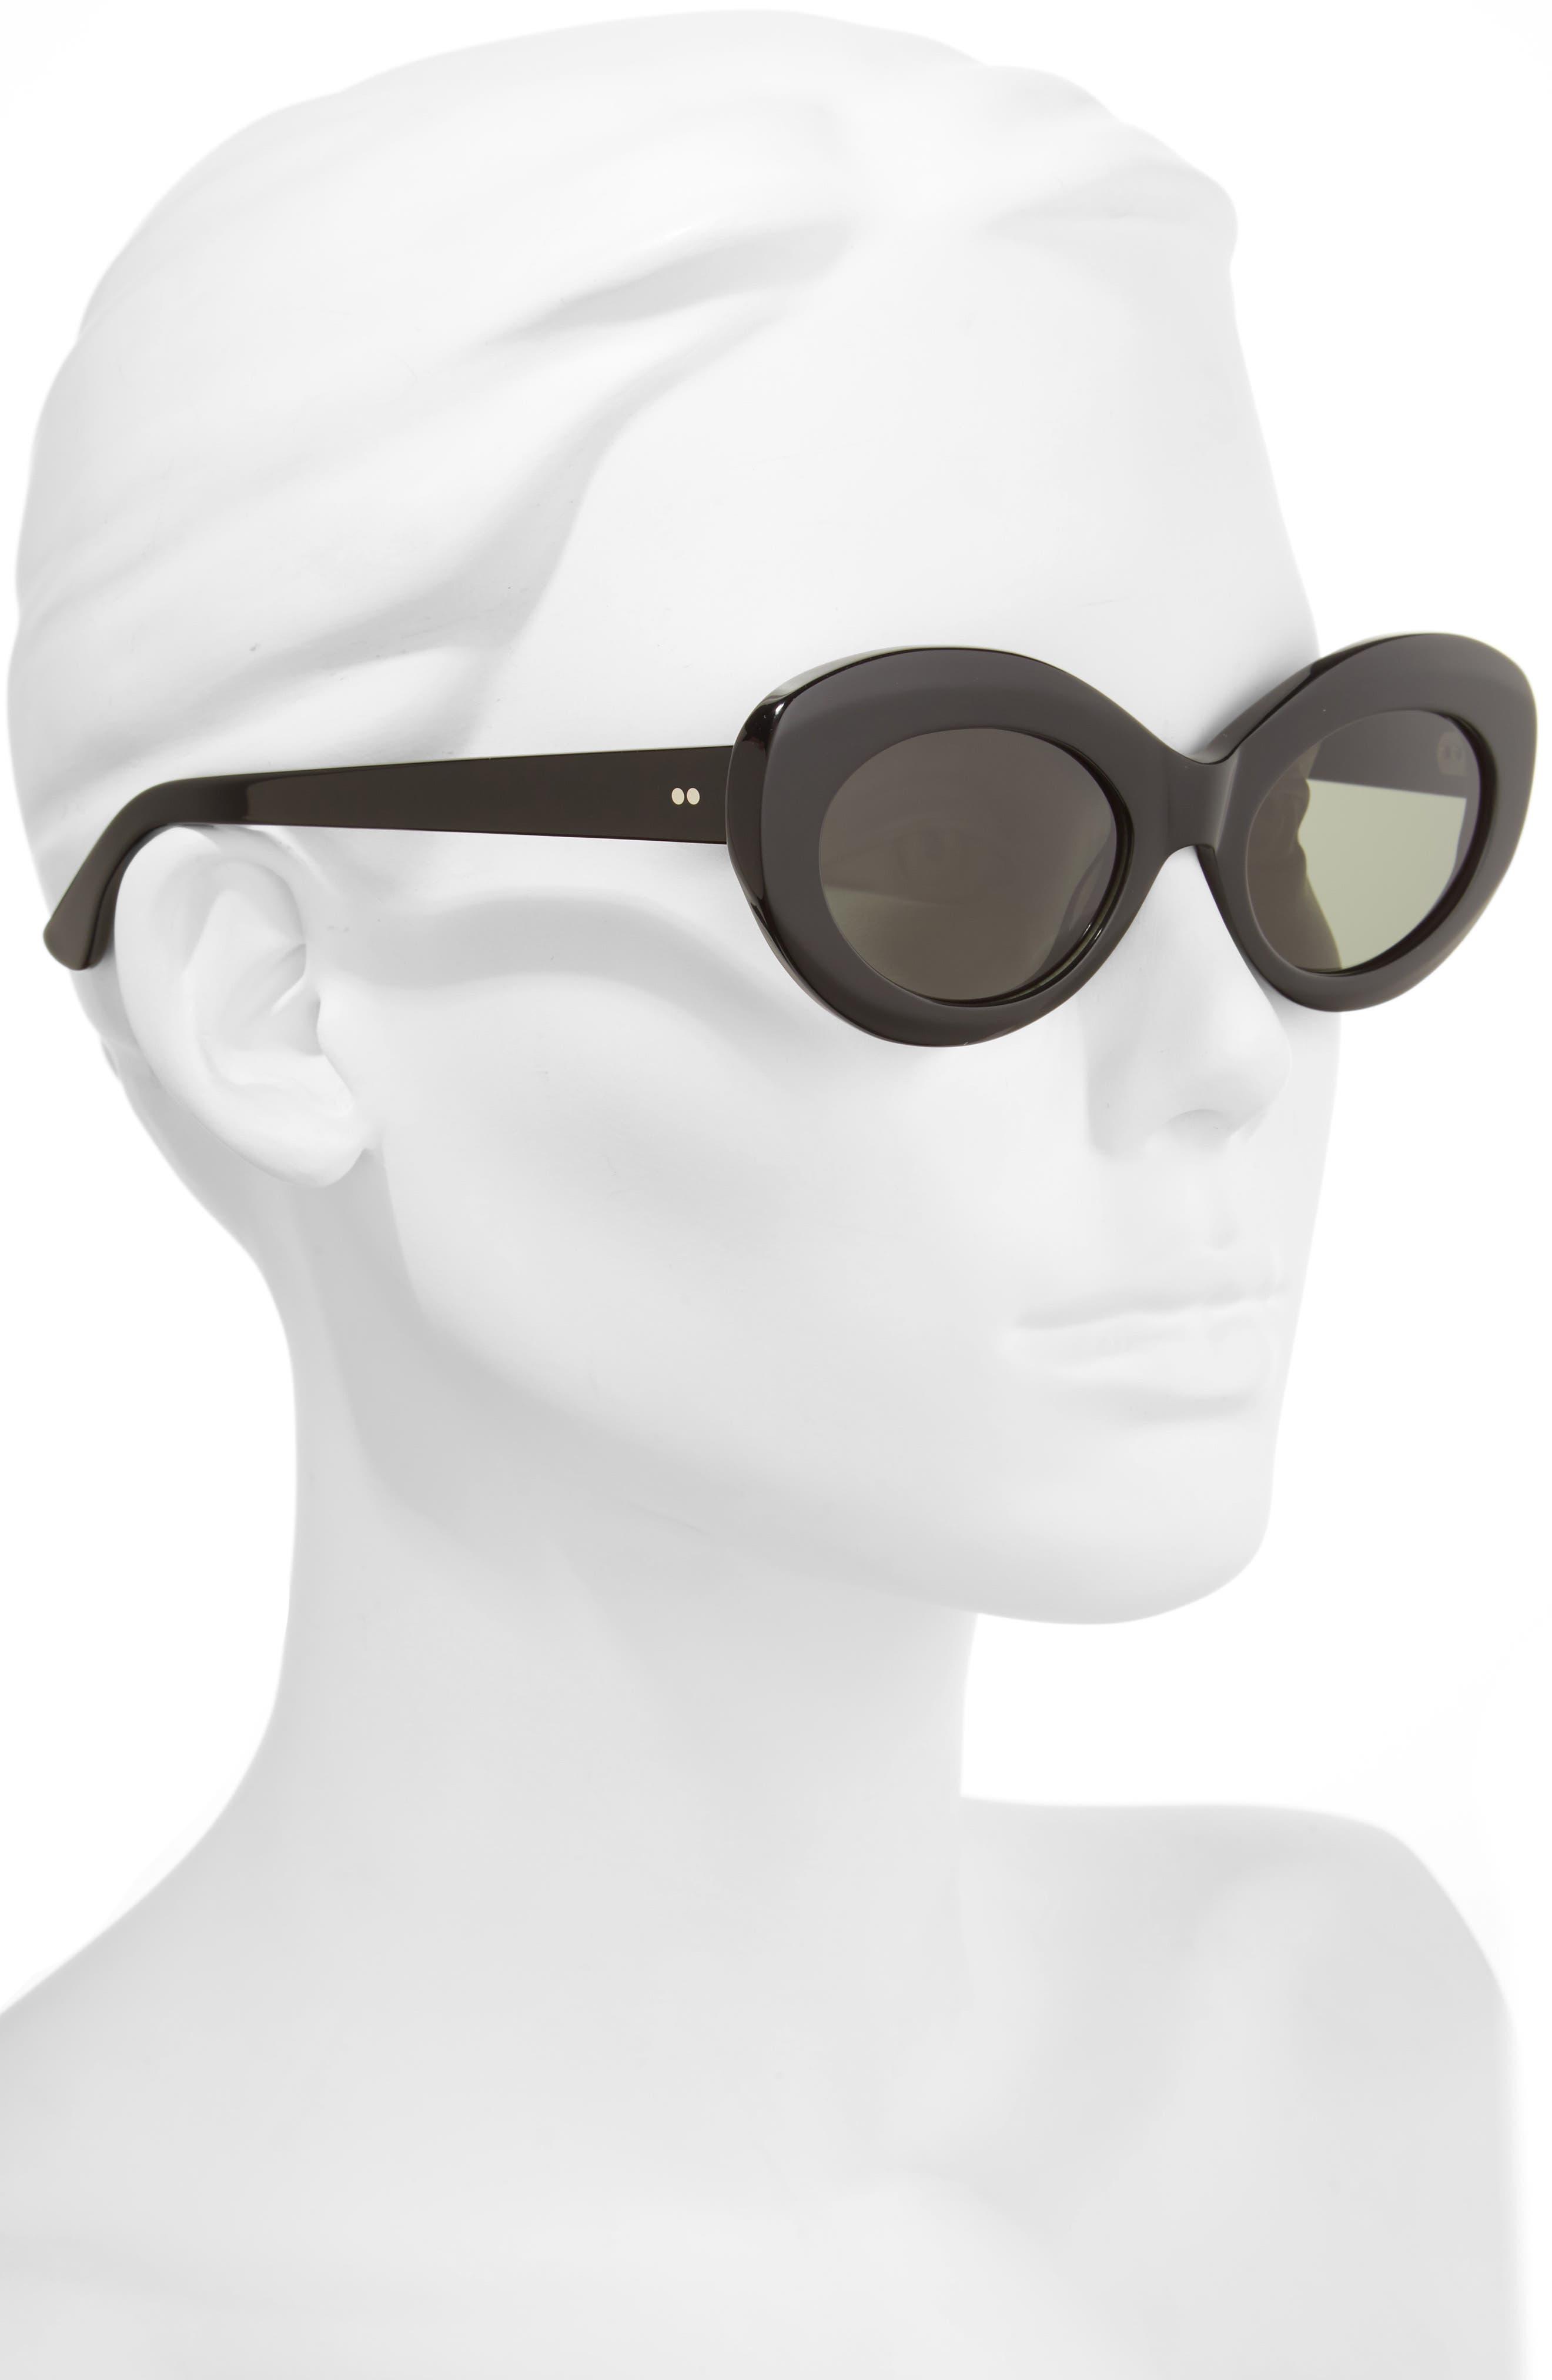 x Alex Knost Luxury Wig Ashtray 53mm Sunglasses,                             Alternate thumbnail 2, color,                             Black/ Black